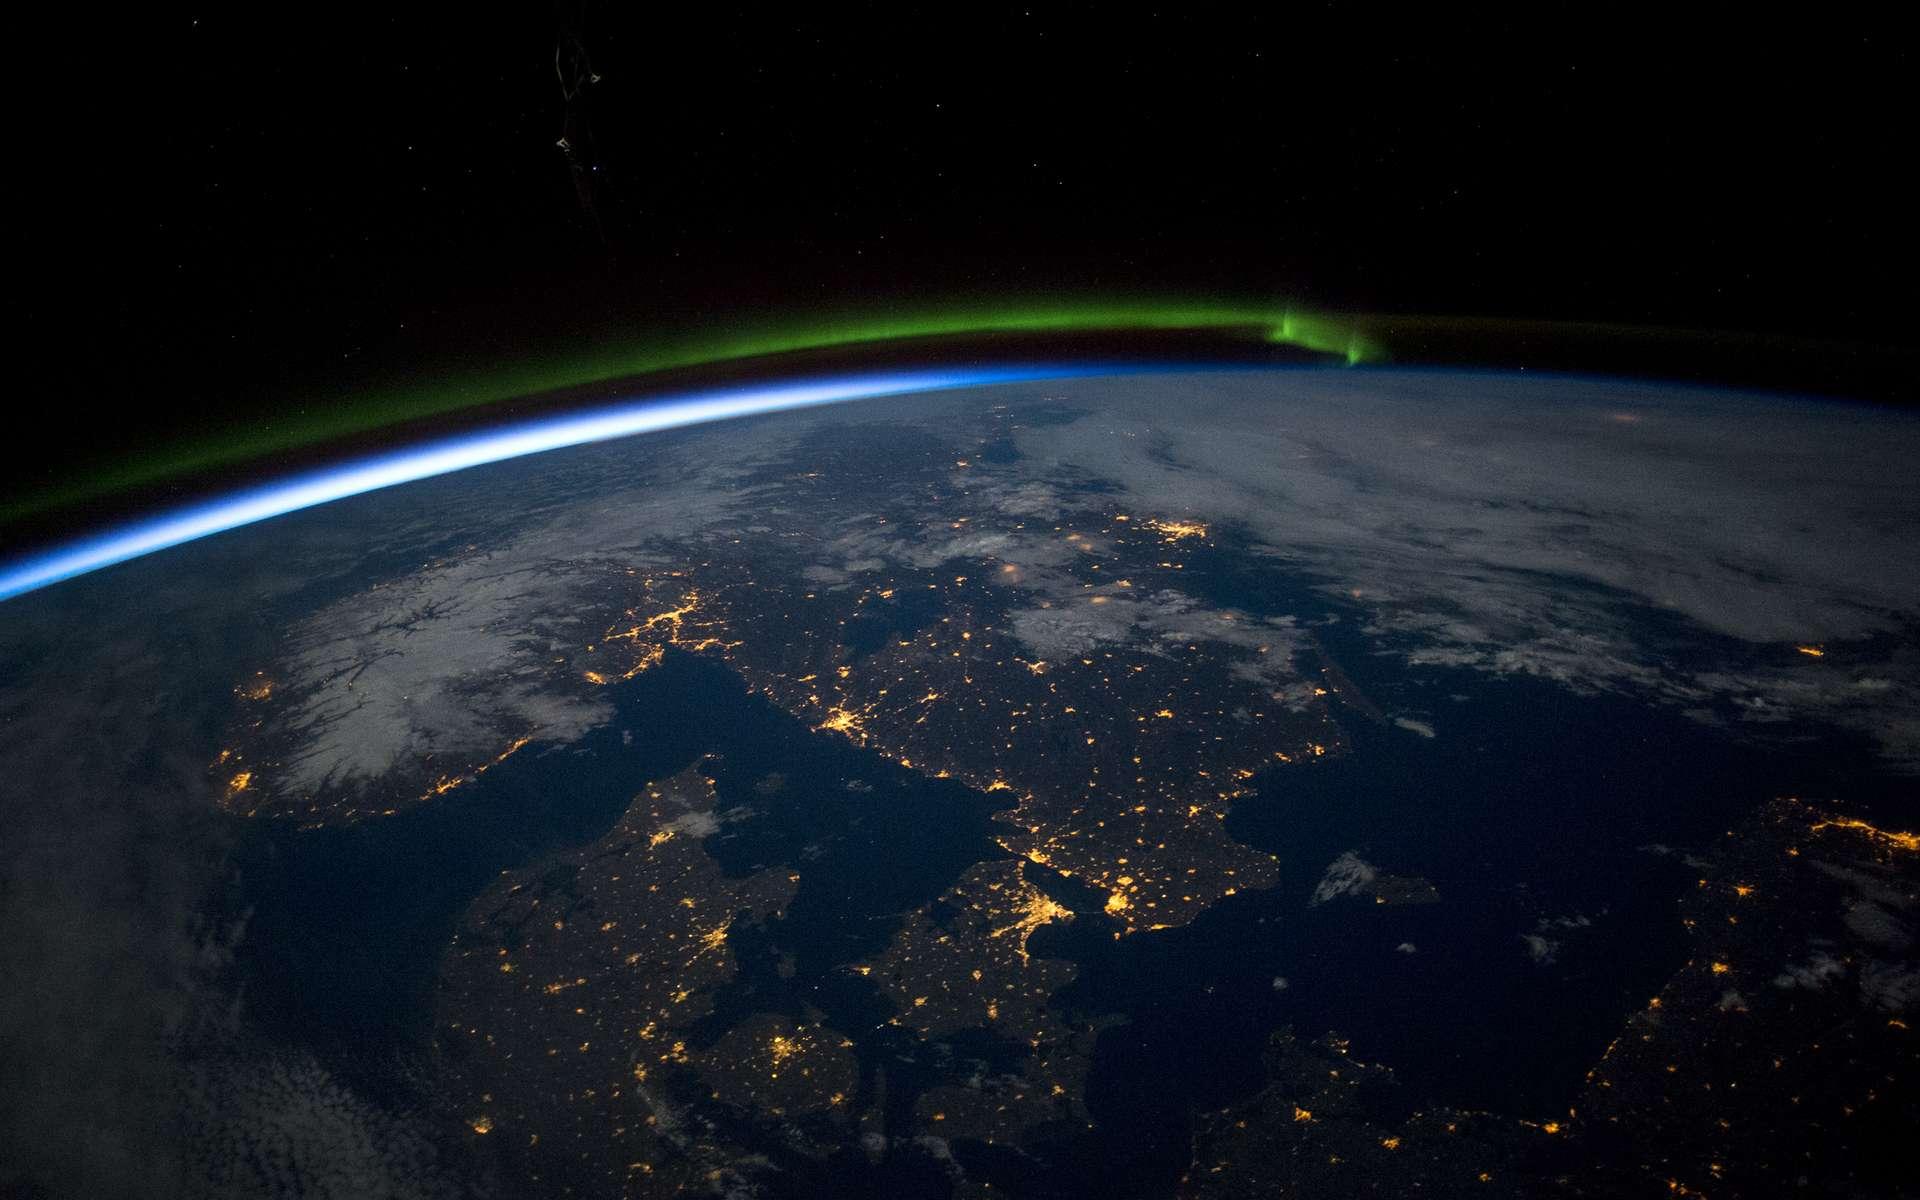 La Scandinavie vue de la Station spatiale en 2015. © Nasa, EarthObservatory